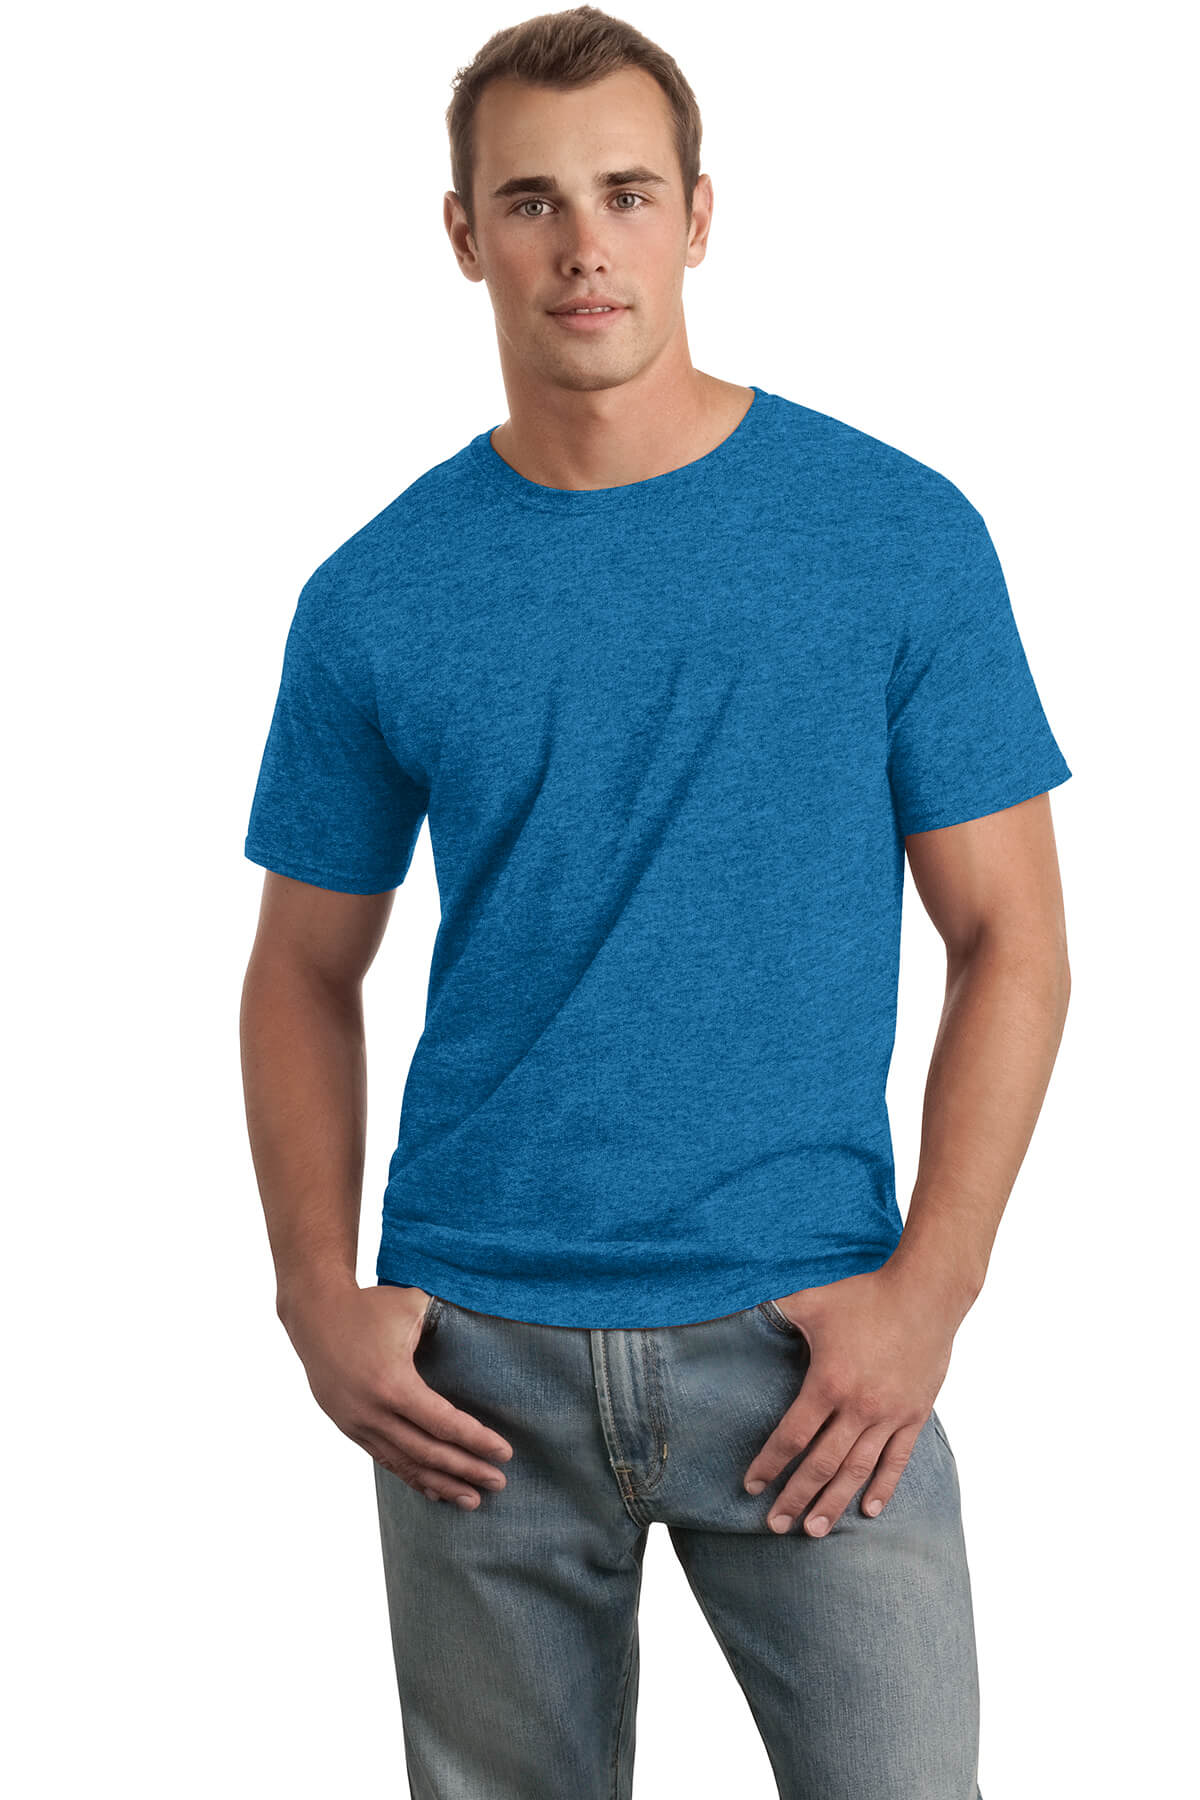 Sapphire T-Shirt Model Front